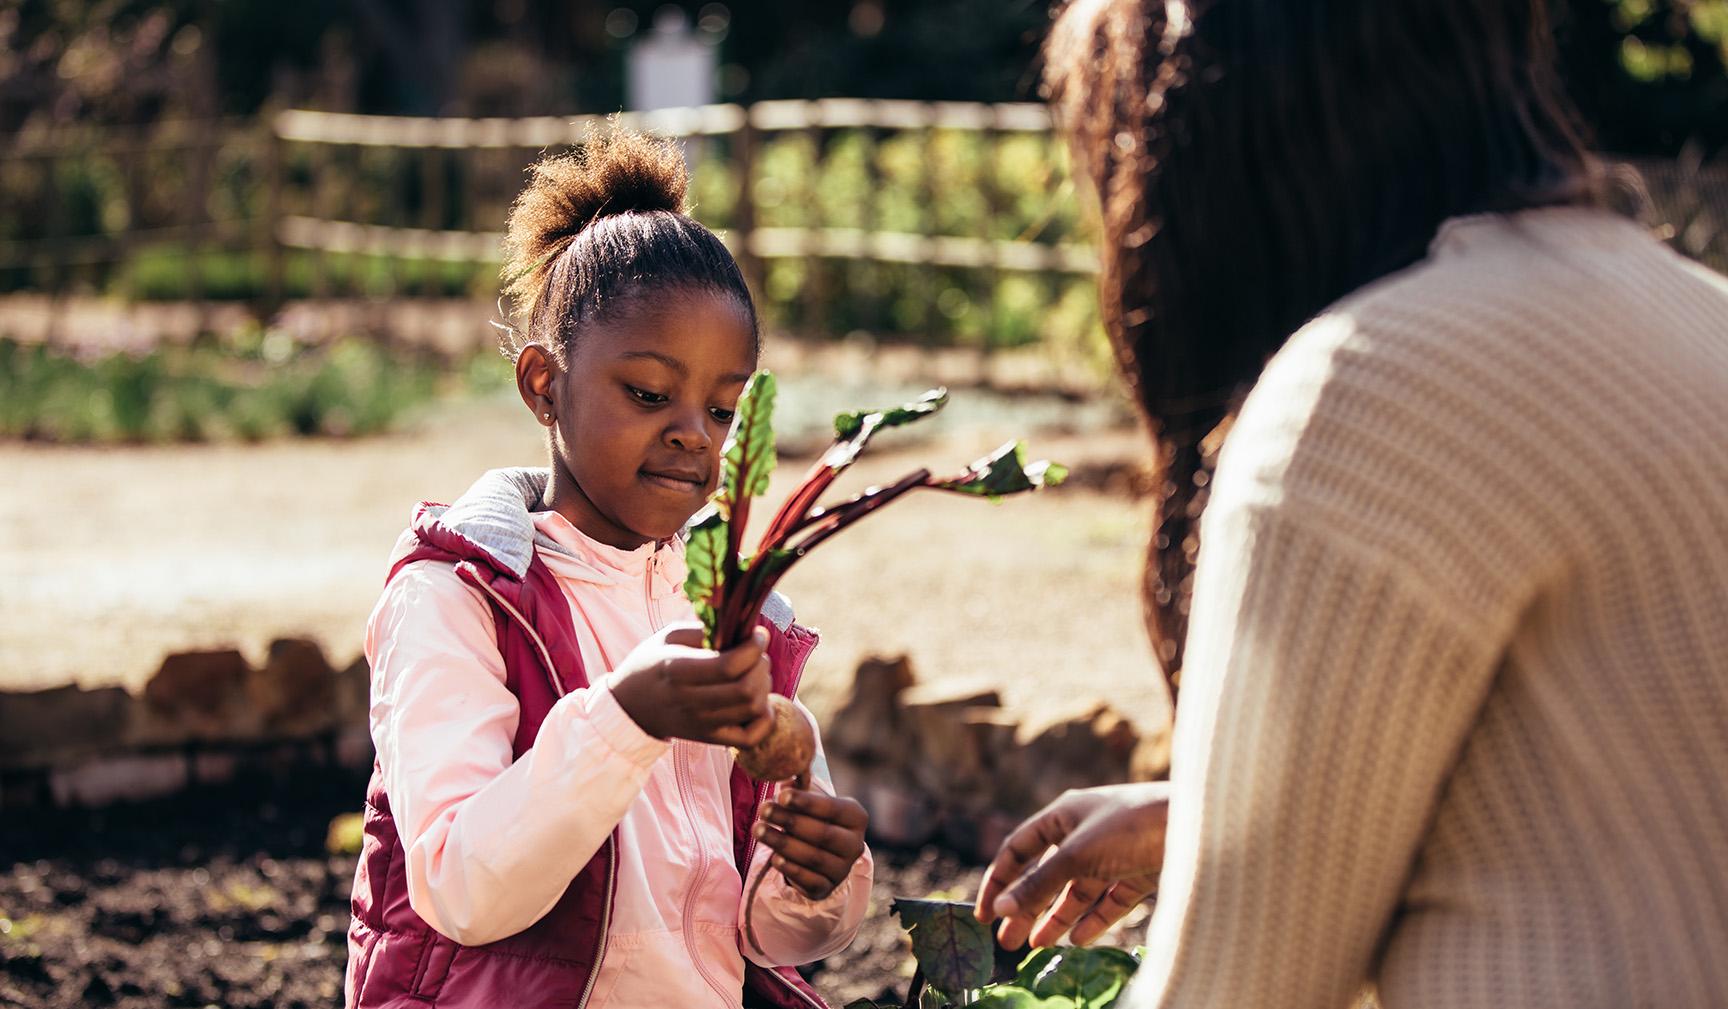 para_youth_farm_hilltop_urban_farm_pittsburgh.jpg